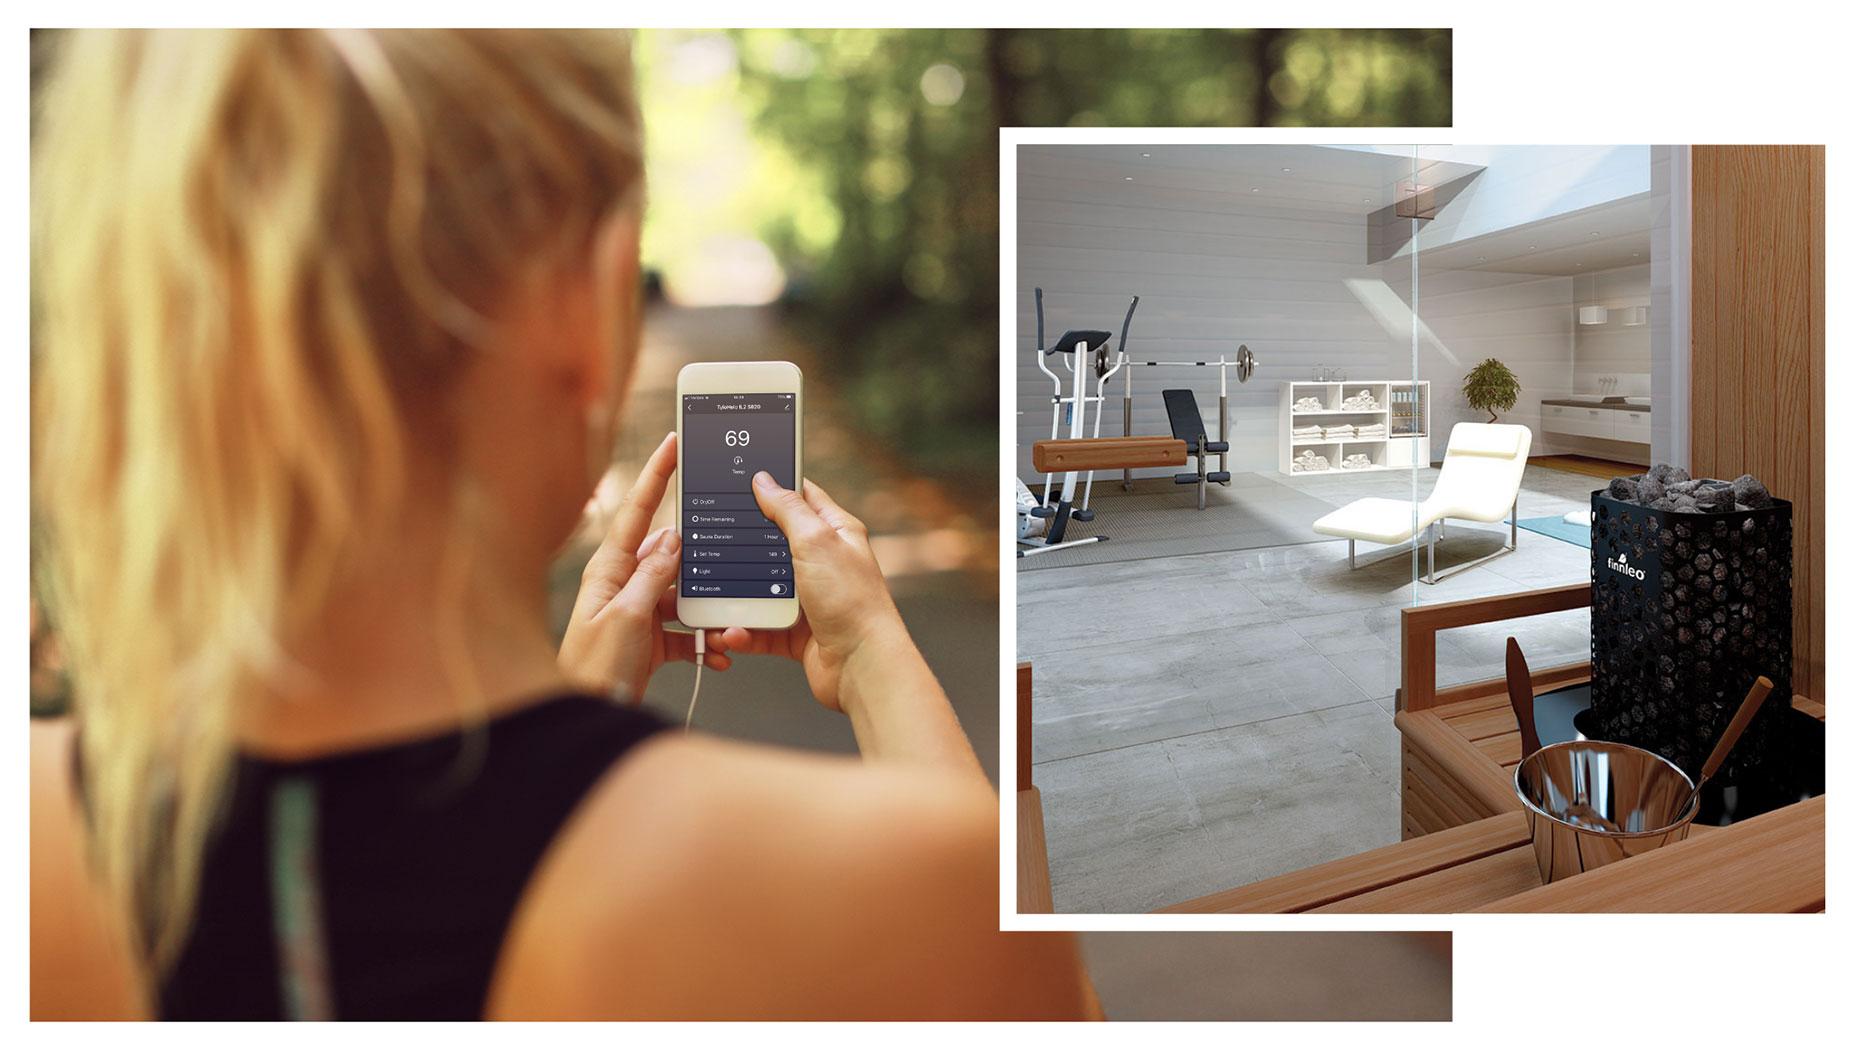 Sauna Study: Post exercise sauna bathing improved exercise performance more than endurance training alone featured image